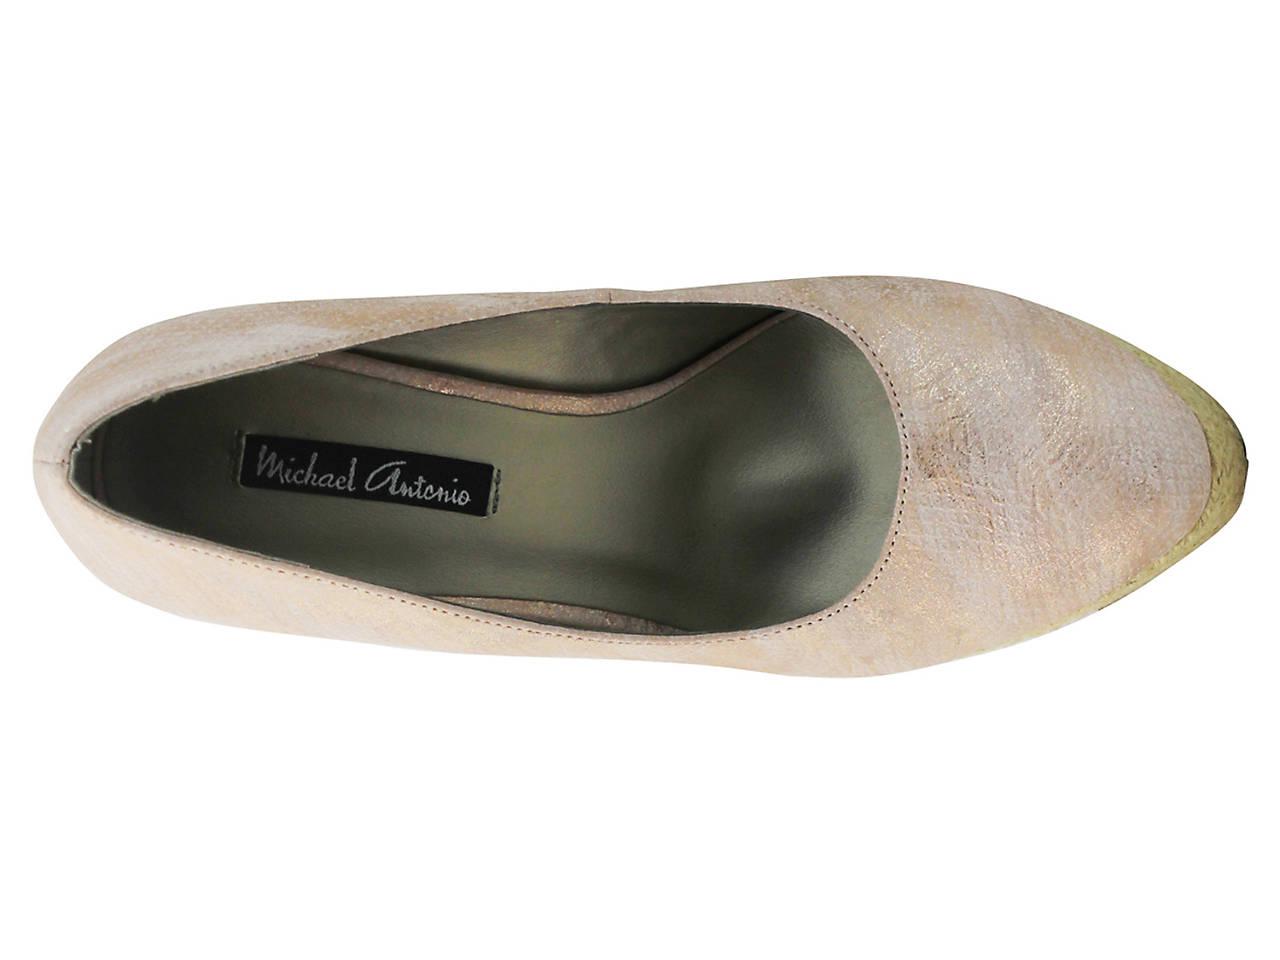 20b0bd645b6 Michael Antonio Anabel Espadrille Wedge Pump Women s Shoes